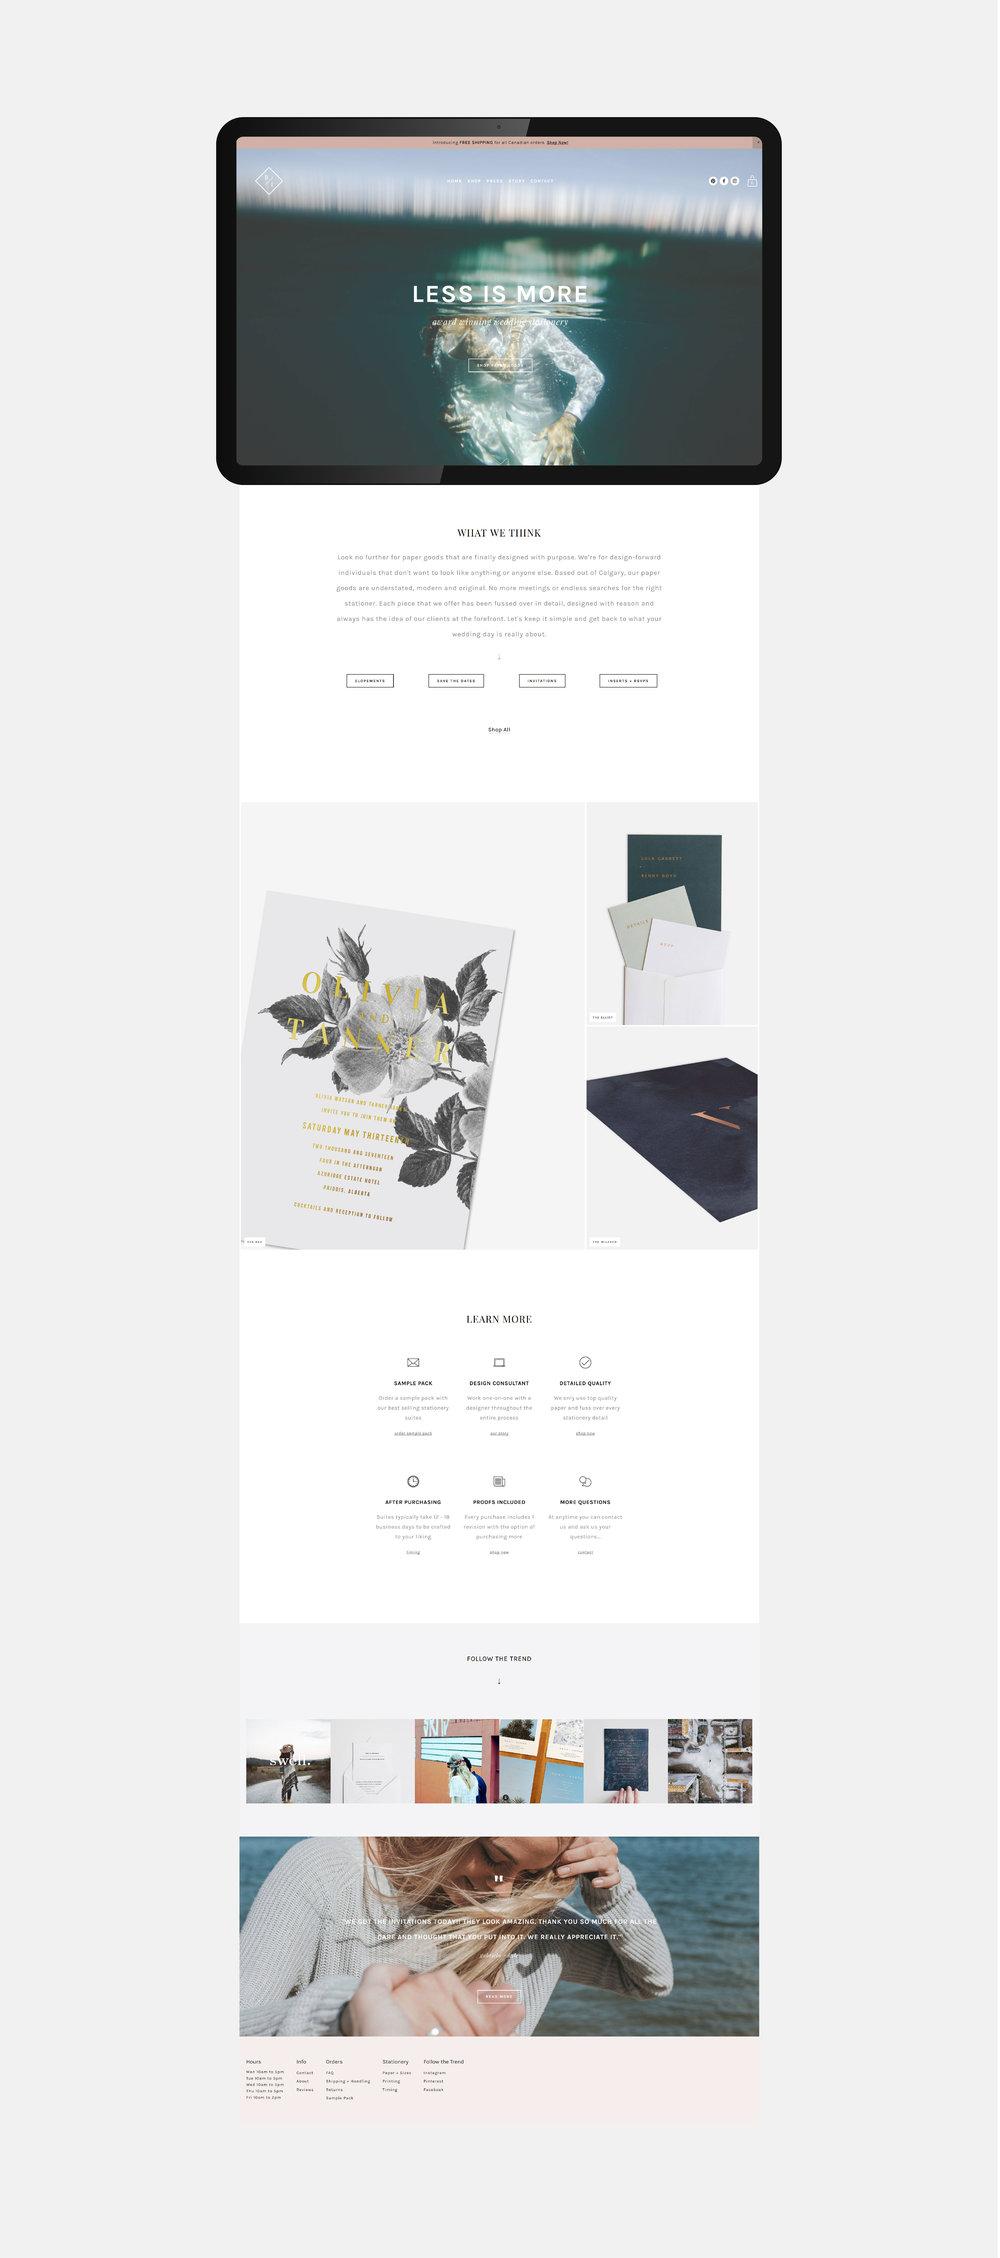 S-website-portfolio-bloom-04.jpg